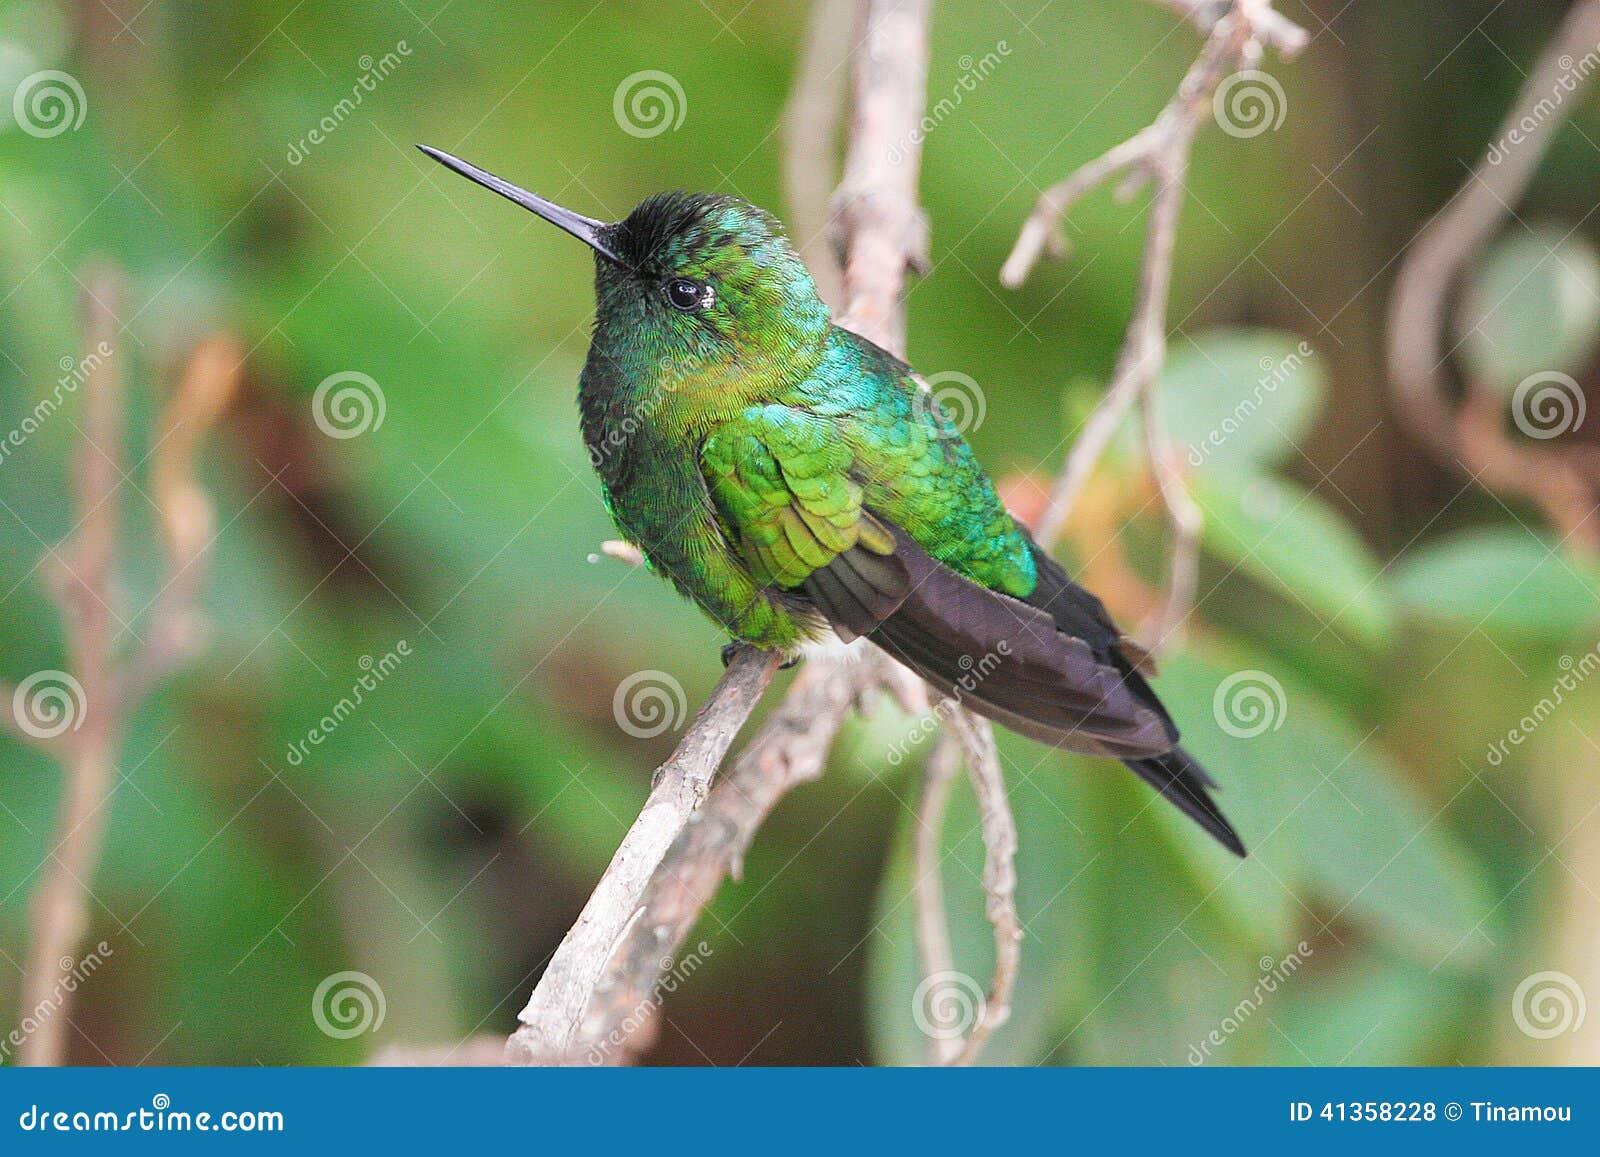 Sapphire-vented Puffleg, hummingbird in Ecuador